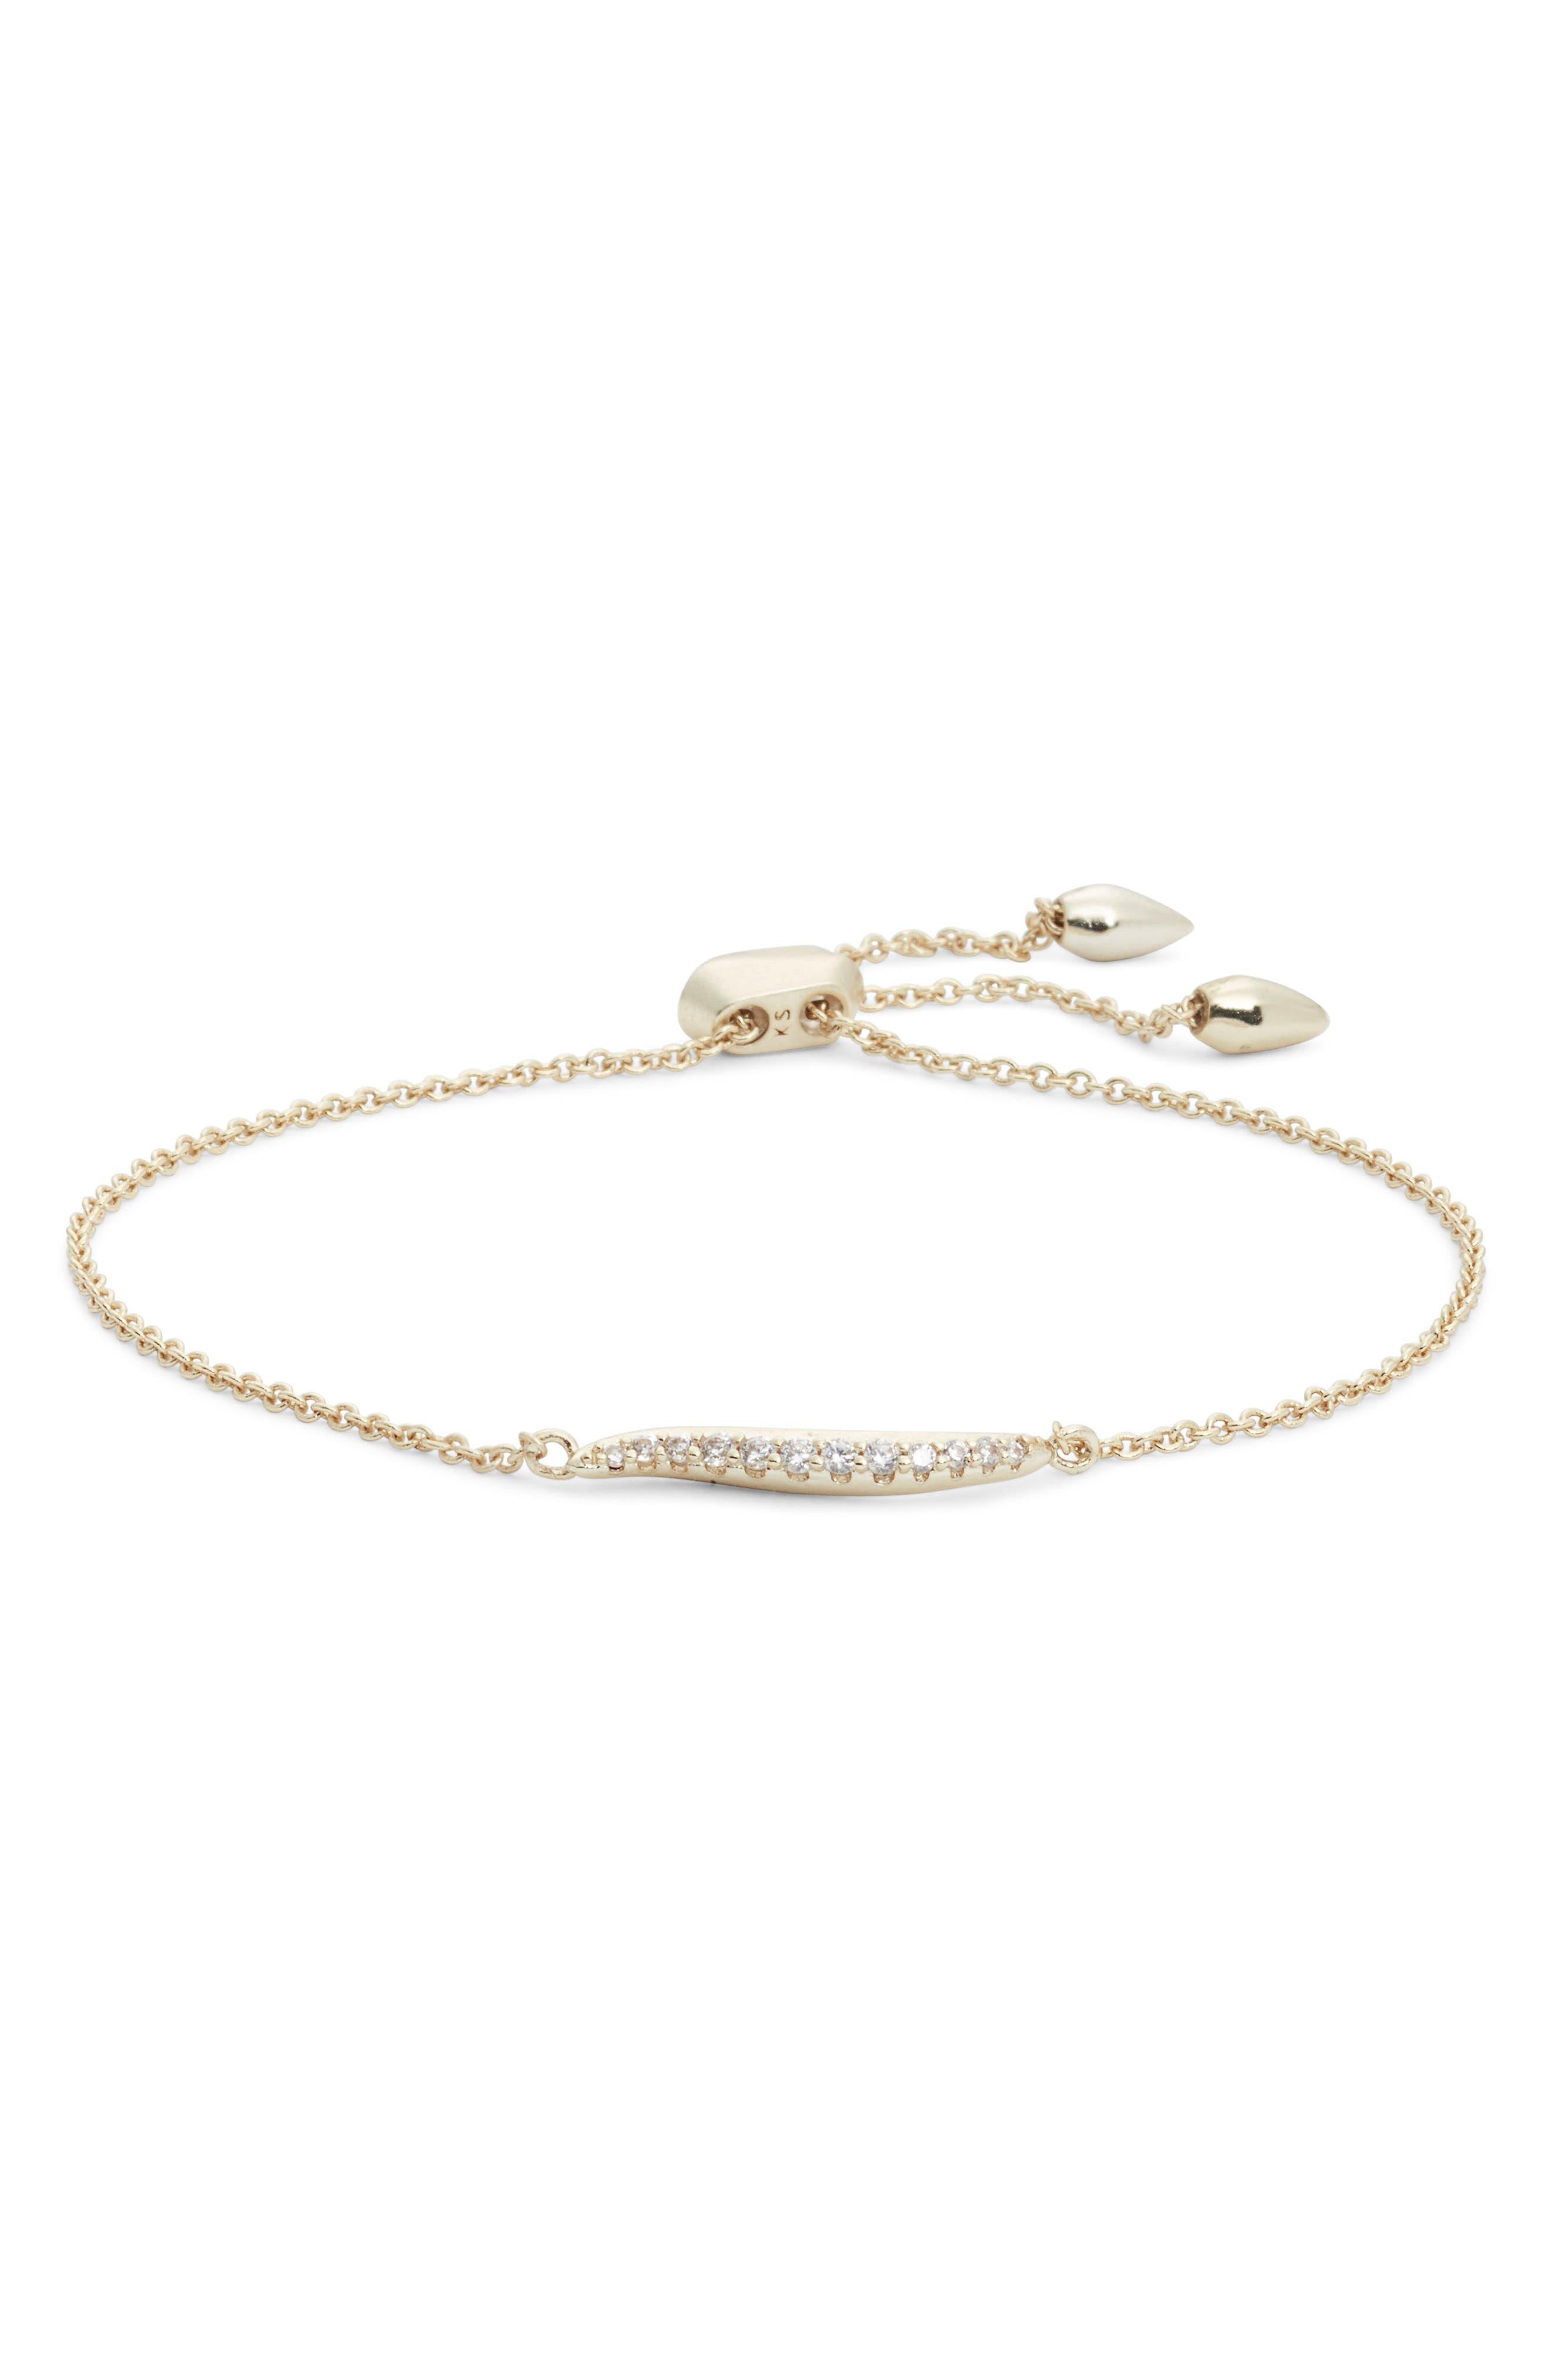 Jemmina Adjustable Bracelet,                         Main,                         color, WHITE CZ/ GOLD METAL